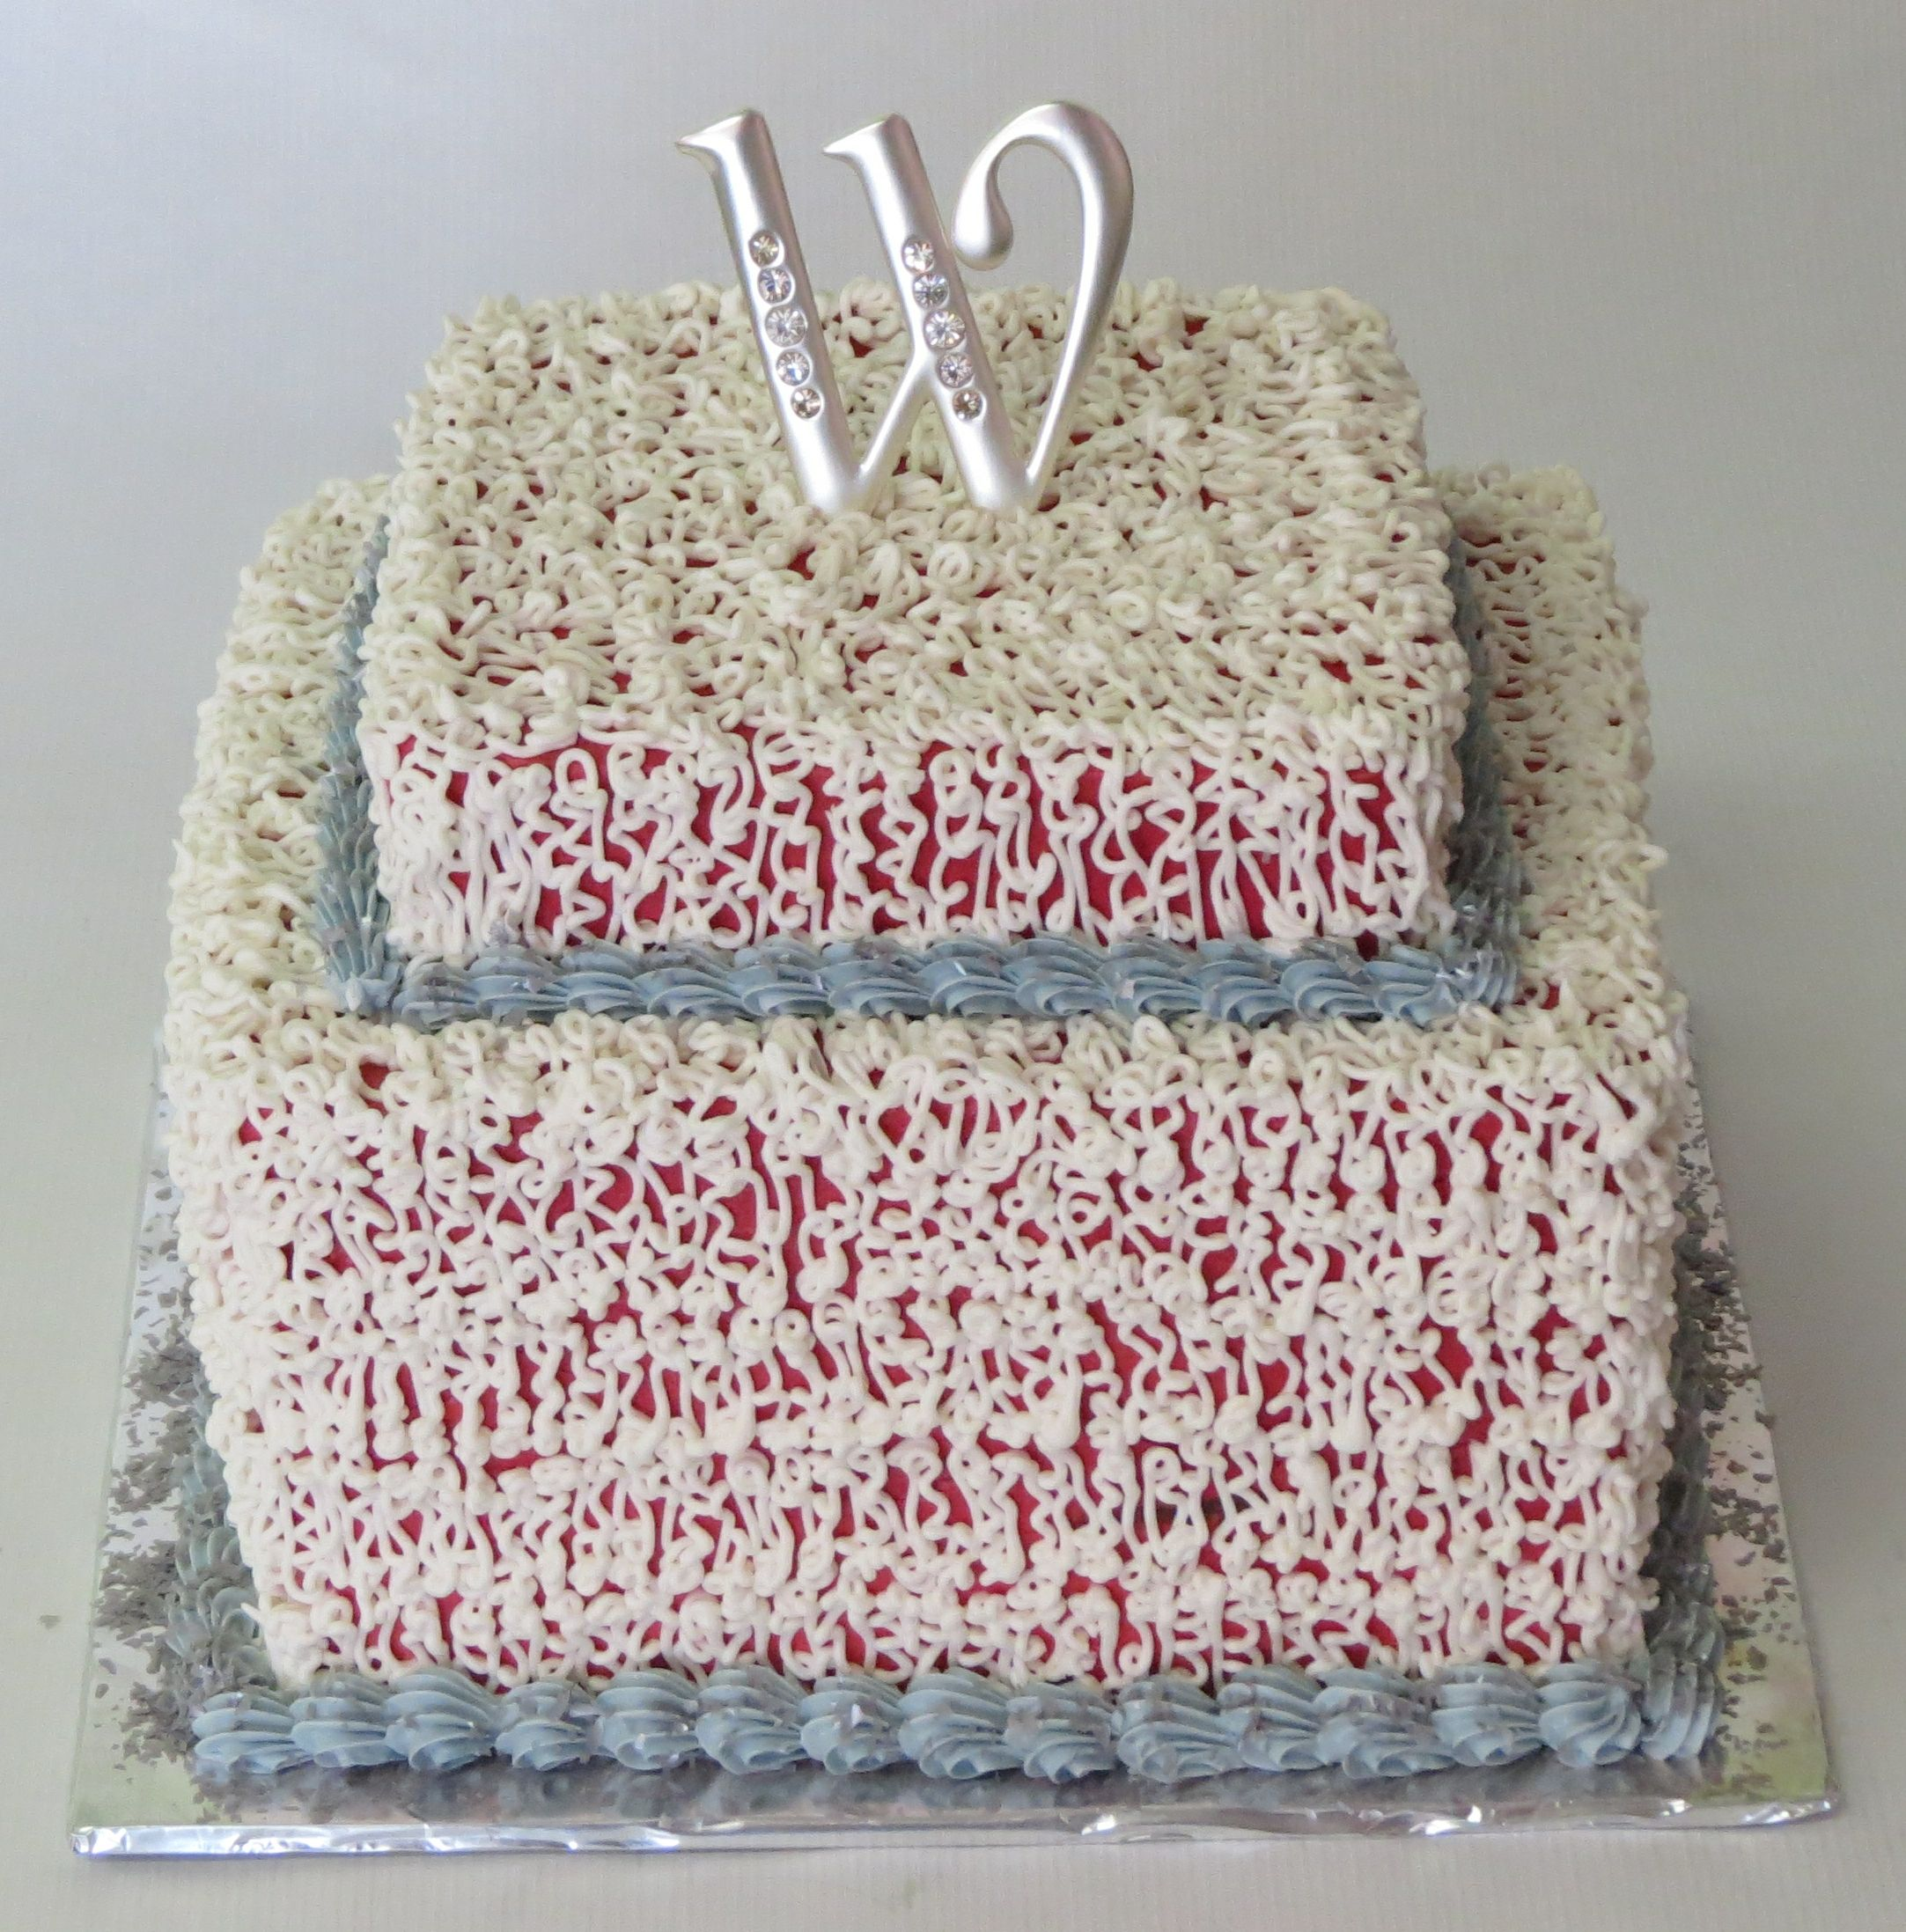 Small Square Wedding Cake White Chantilly Lace Over Red Weddingcake Simpleweddingcakes